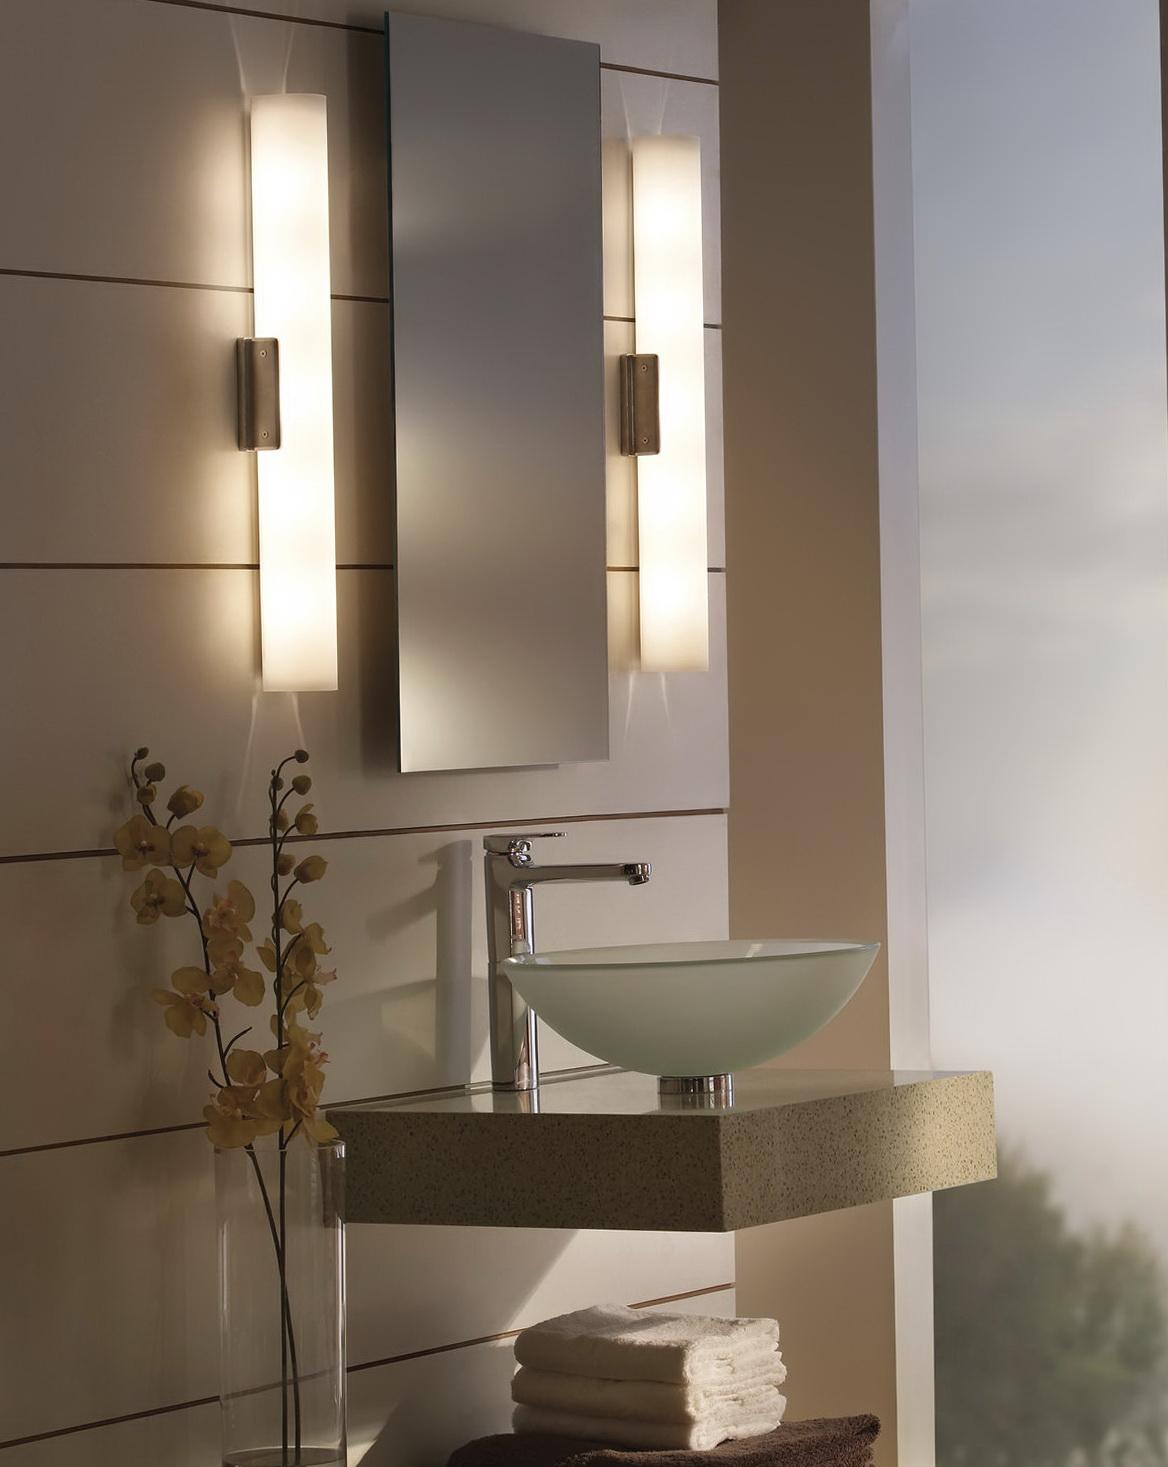 Bathroom Mirror With Lights Around It Home Design Ideas